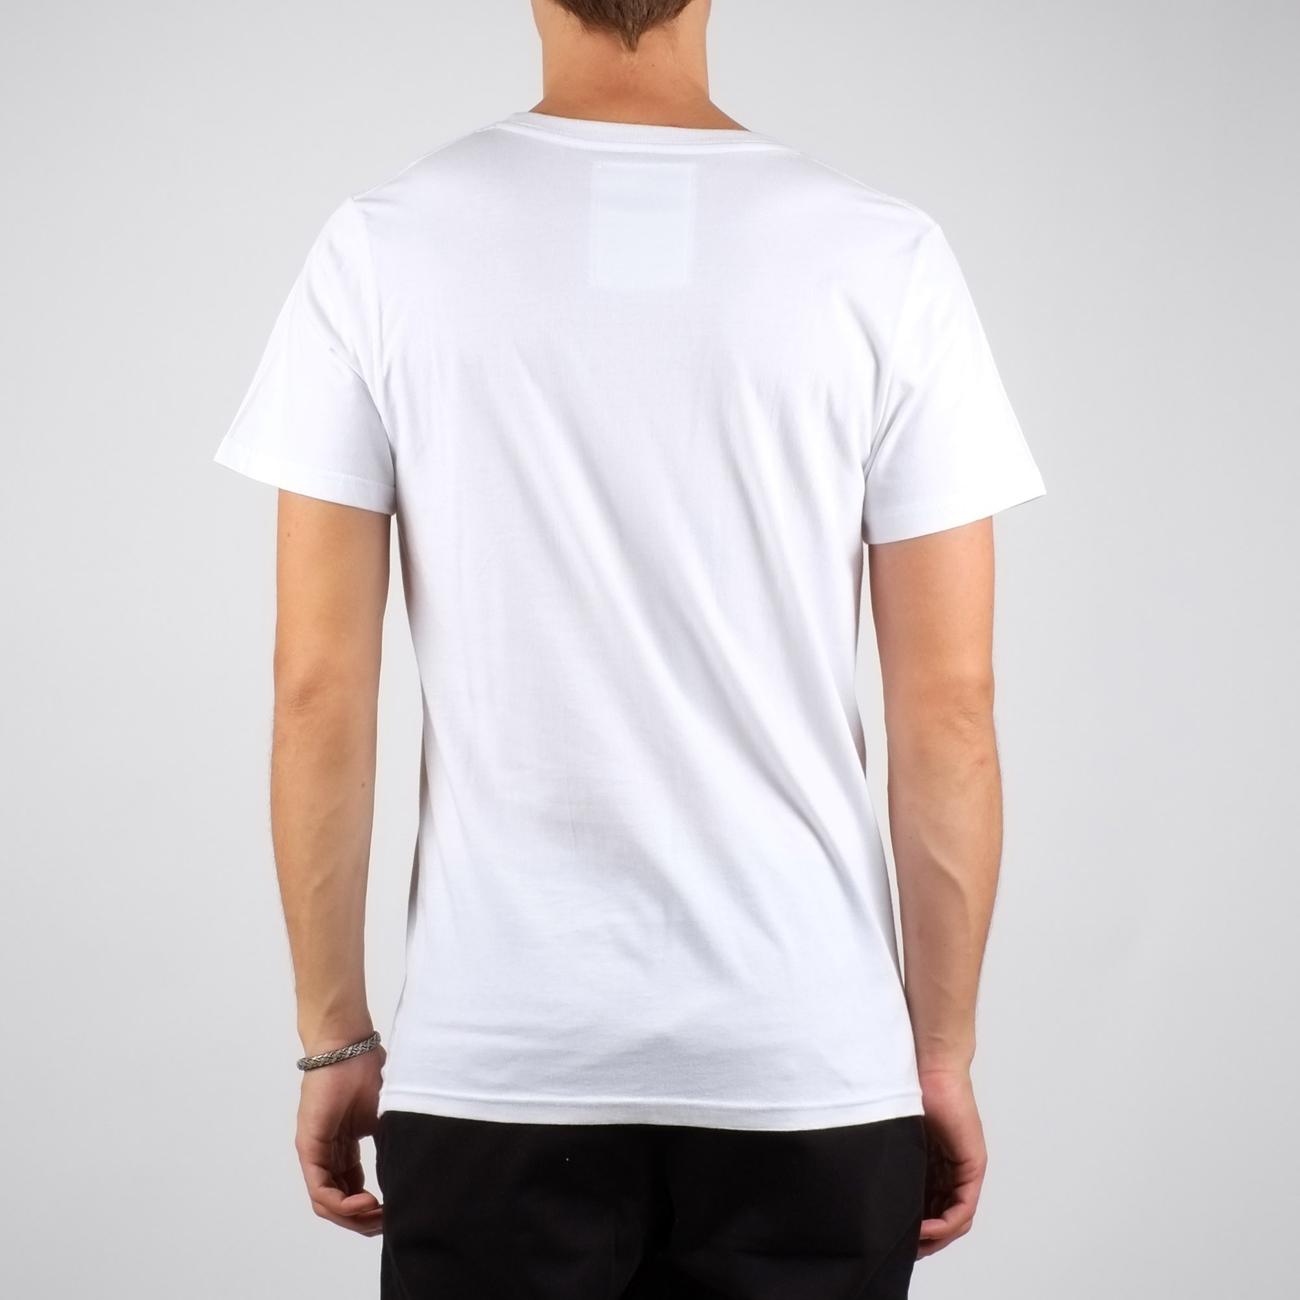 Stockholm T-shirt Coffee Vinyl